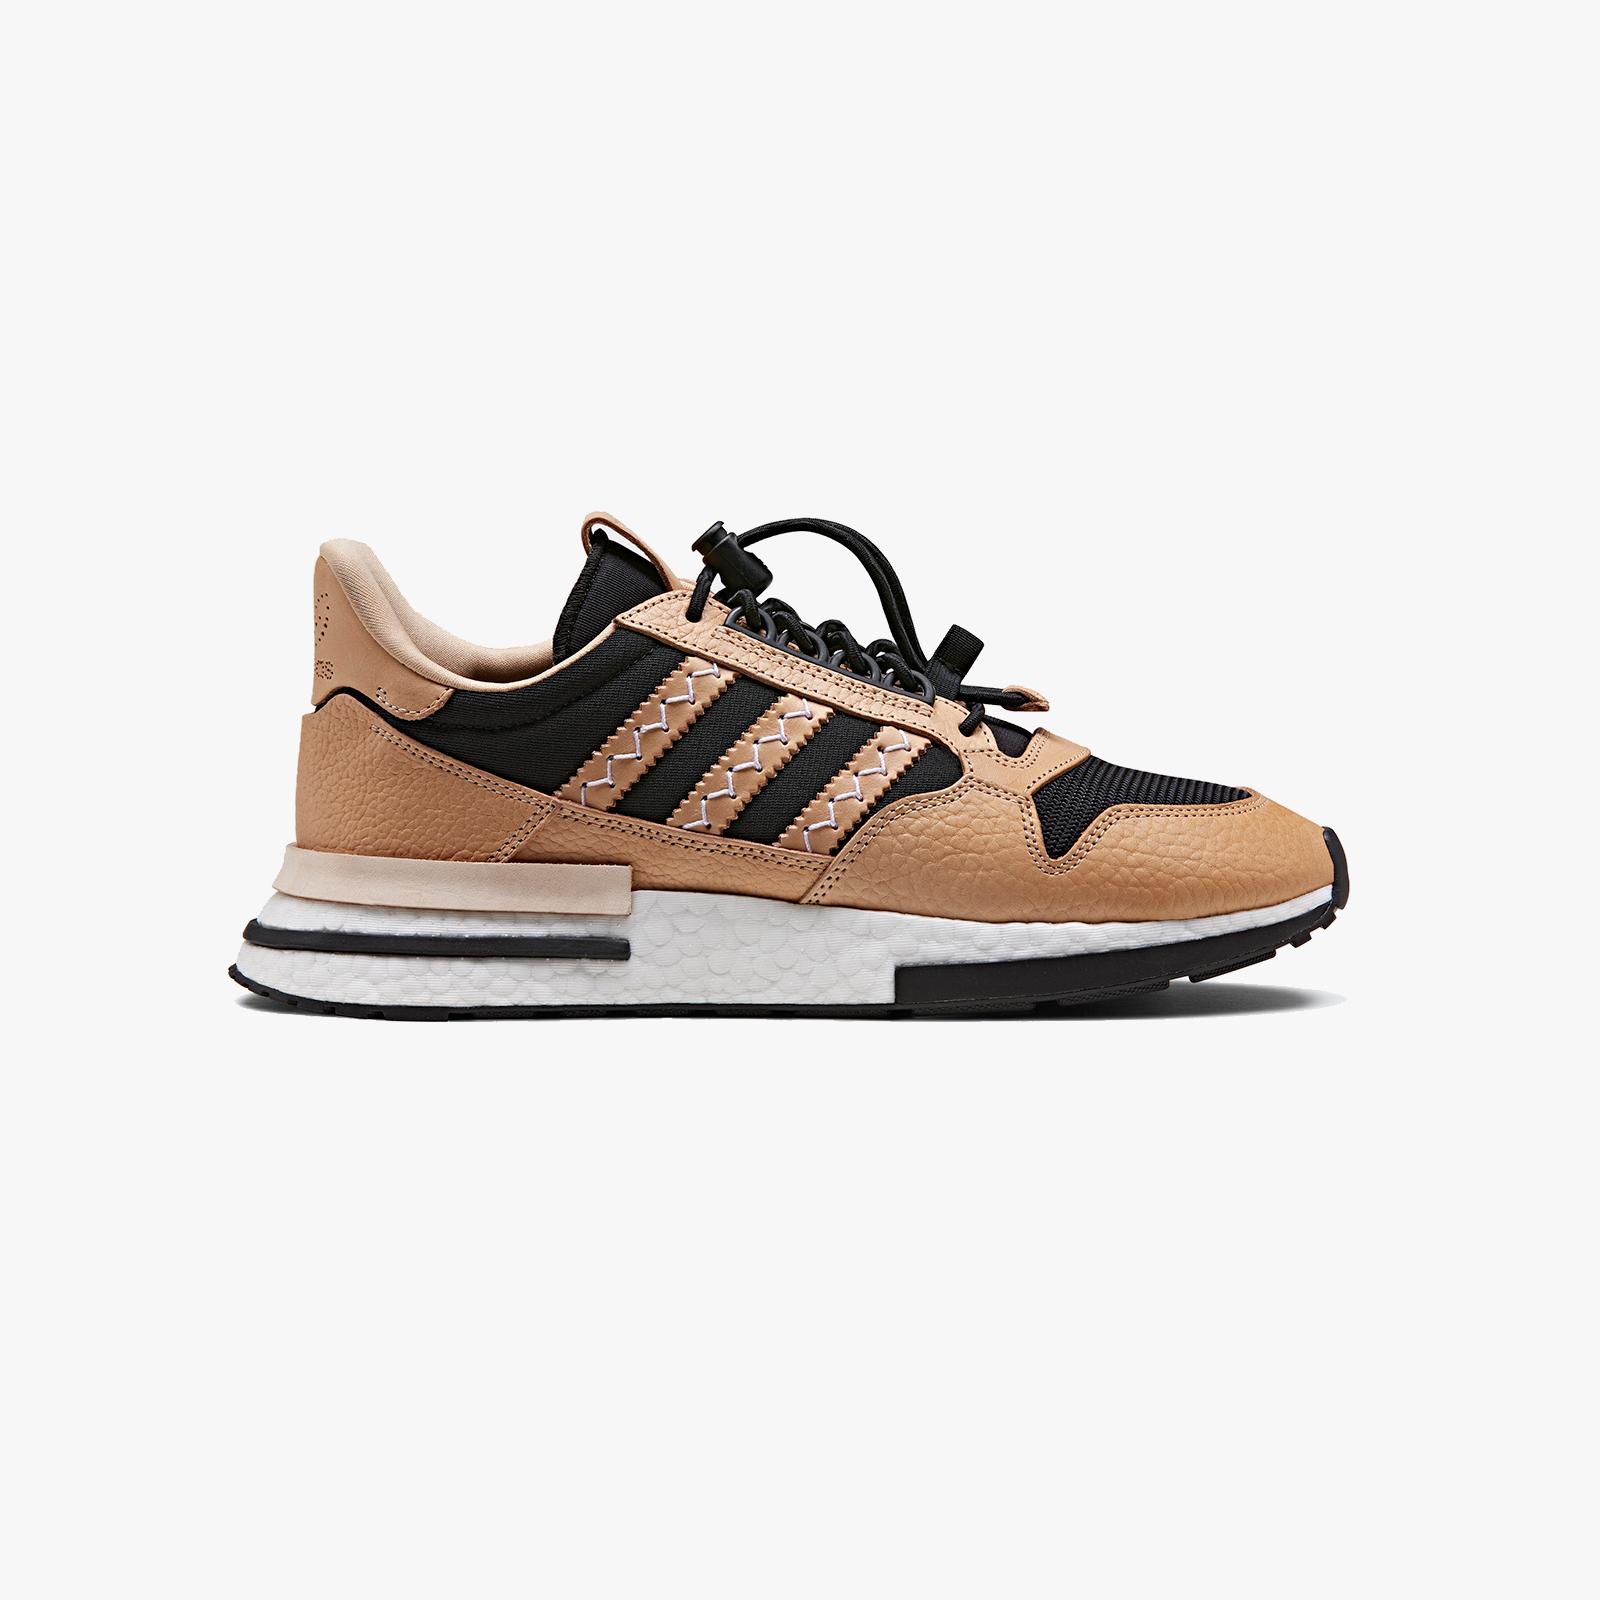 2b8171859b7c7 adidas ZX 500 RM MT x Hender Scheme - F36047 - Sneakersnstuff